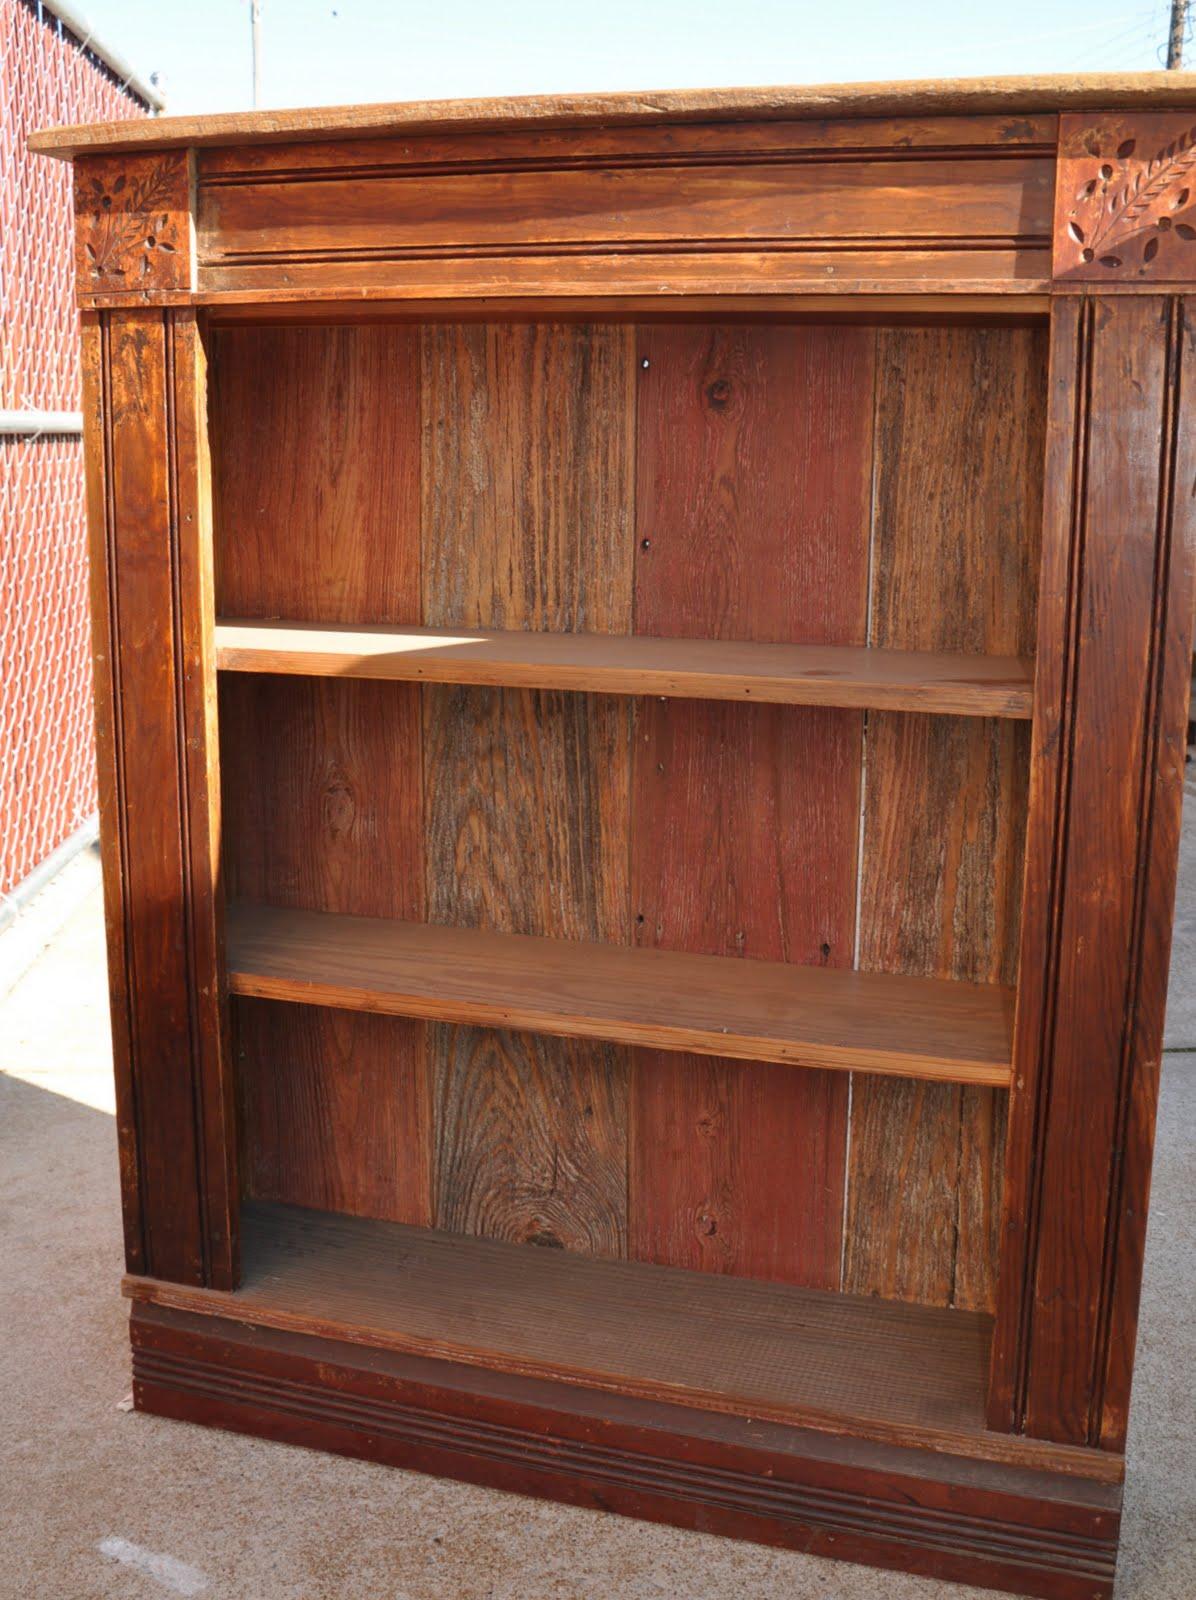 Oklahoma Barn Market: Reclaimed Barnwood Shelf